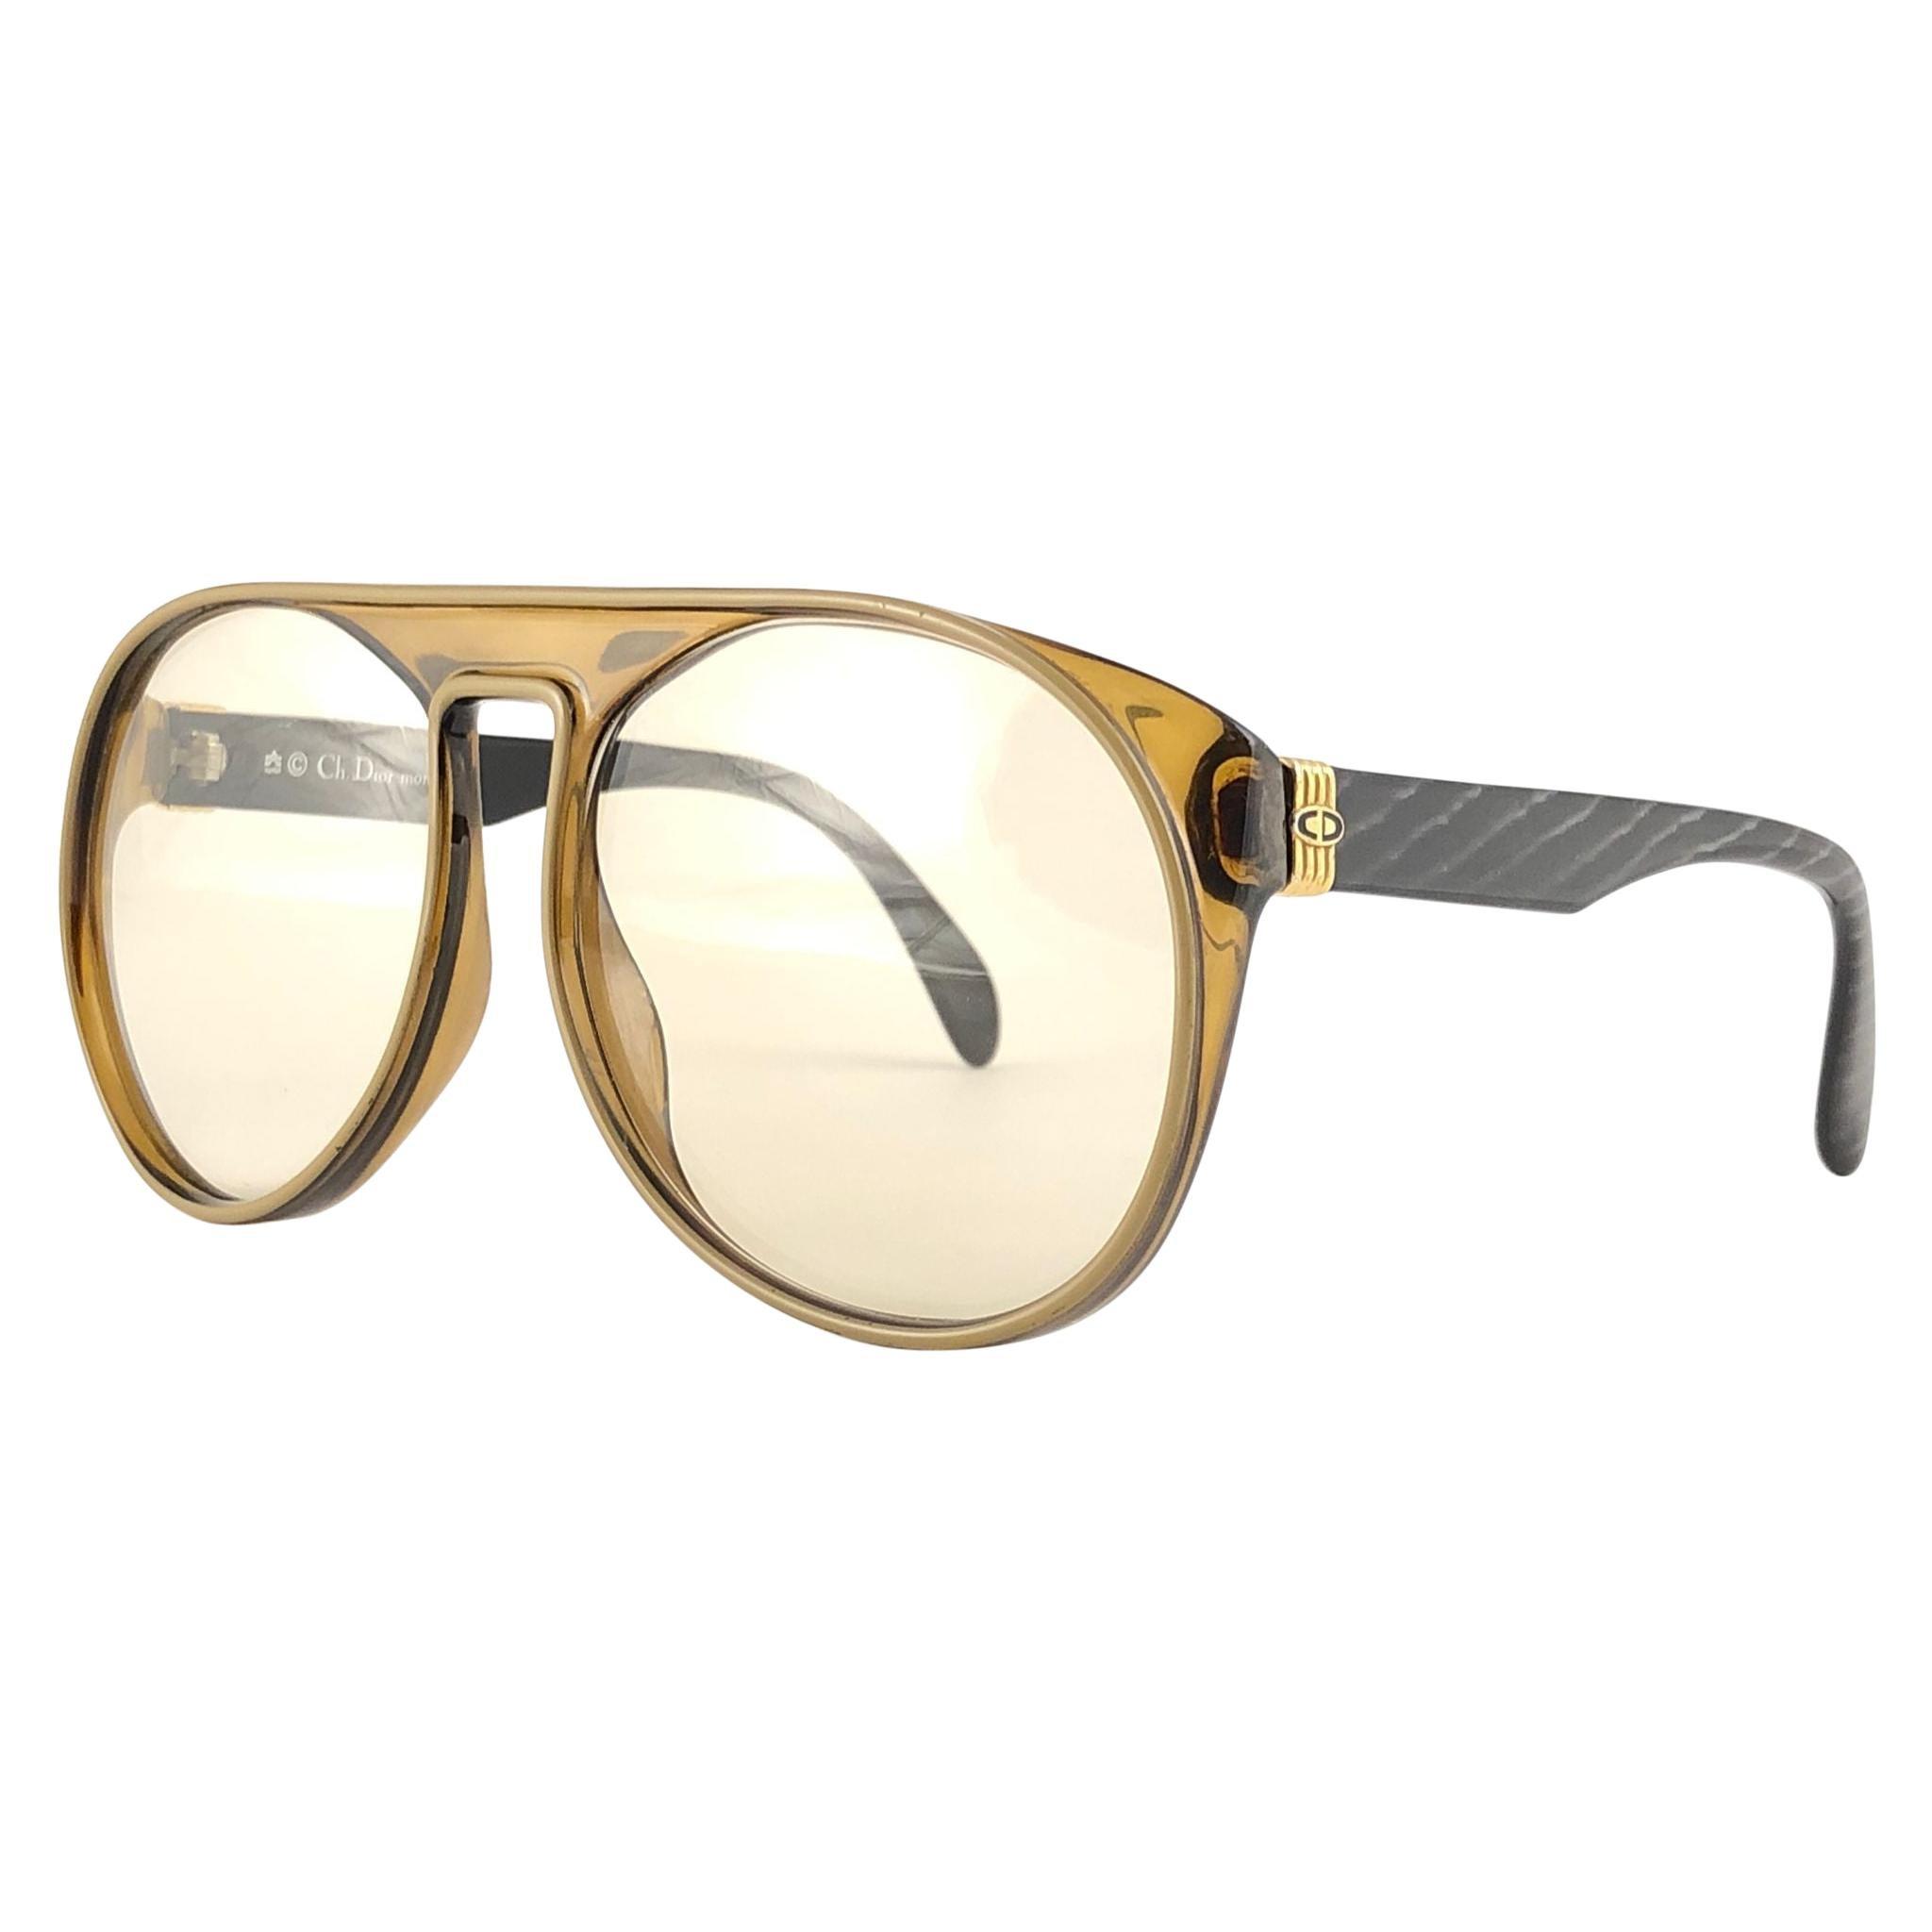 New Vintage Christian Dior Monsieur 2317 Oversized Gold Amber Sunglasses 1970